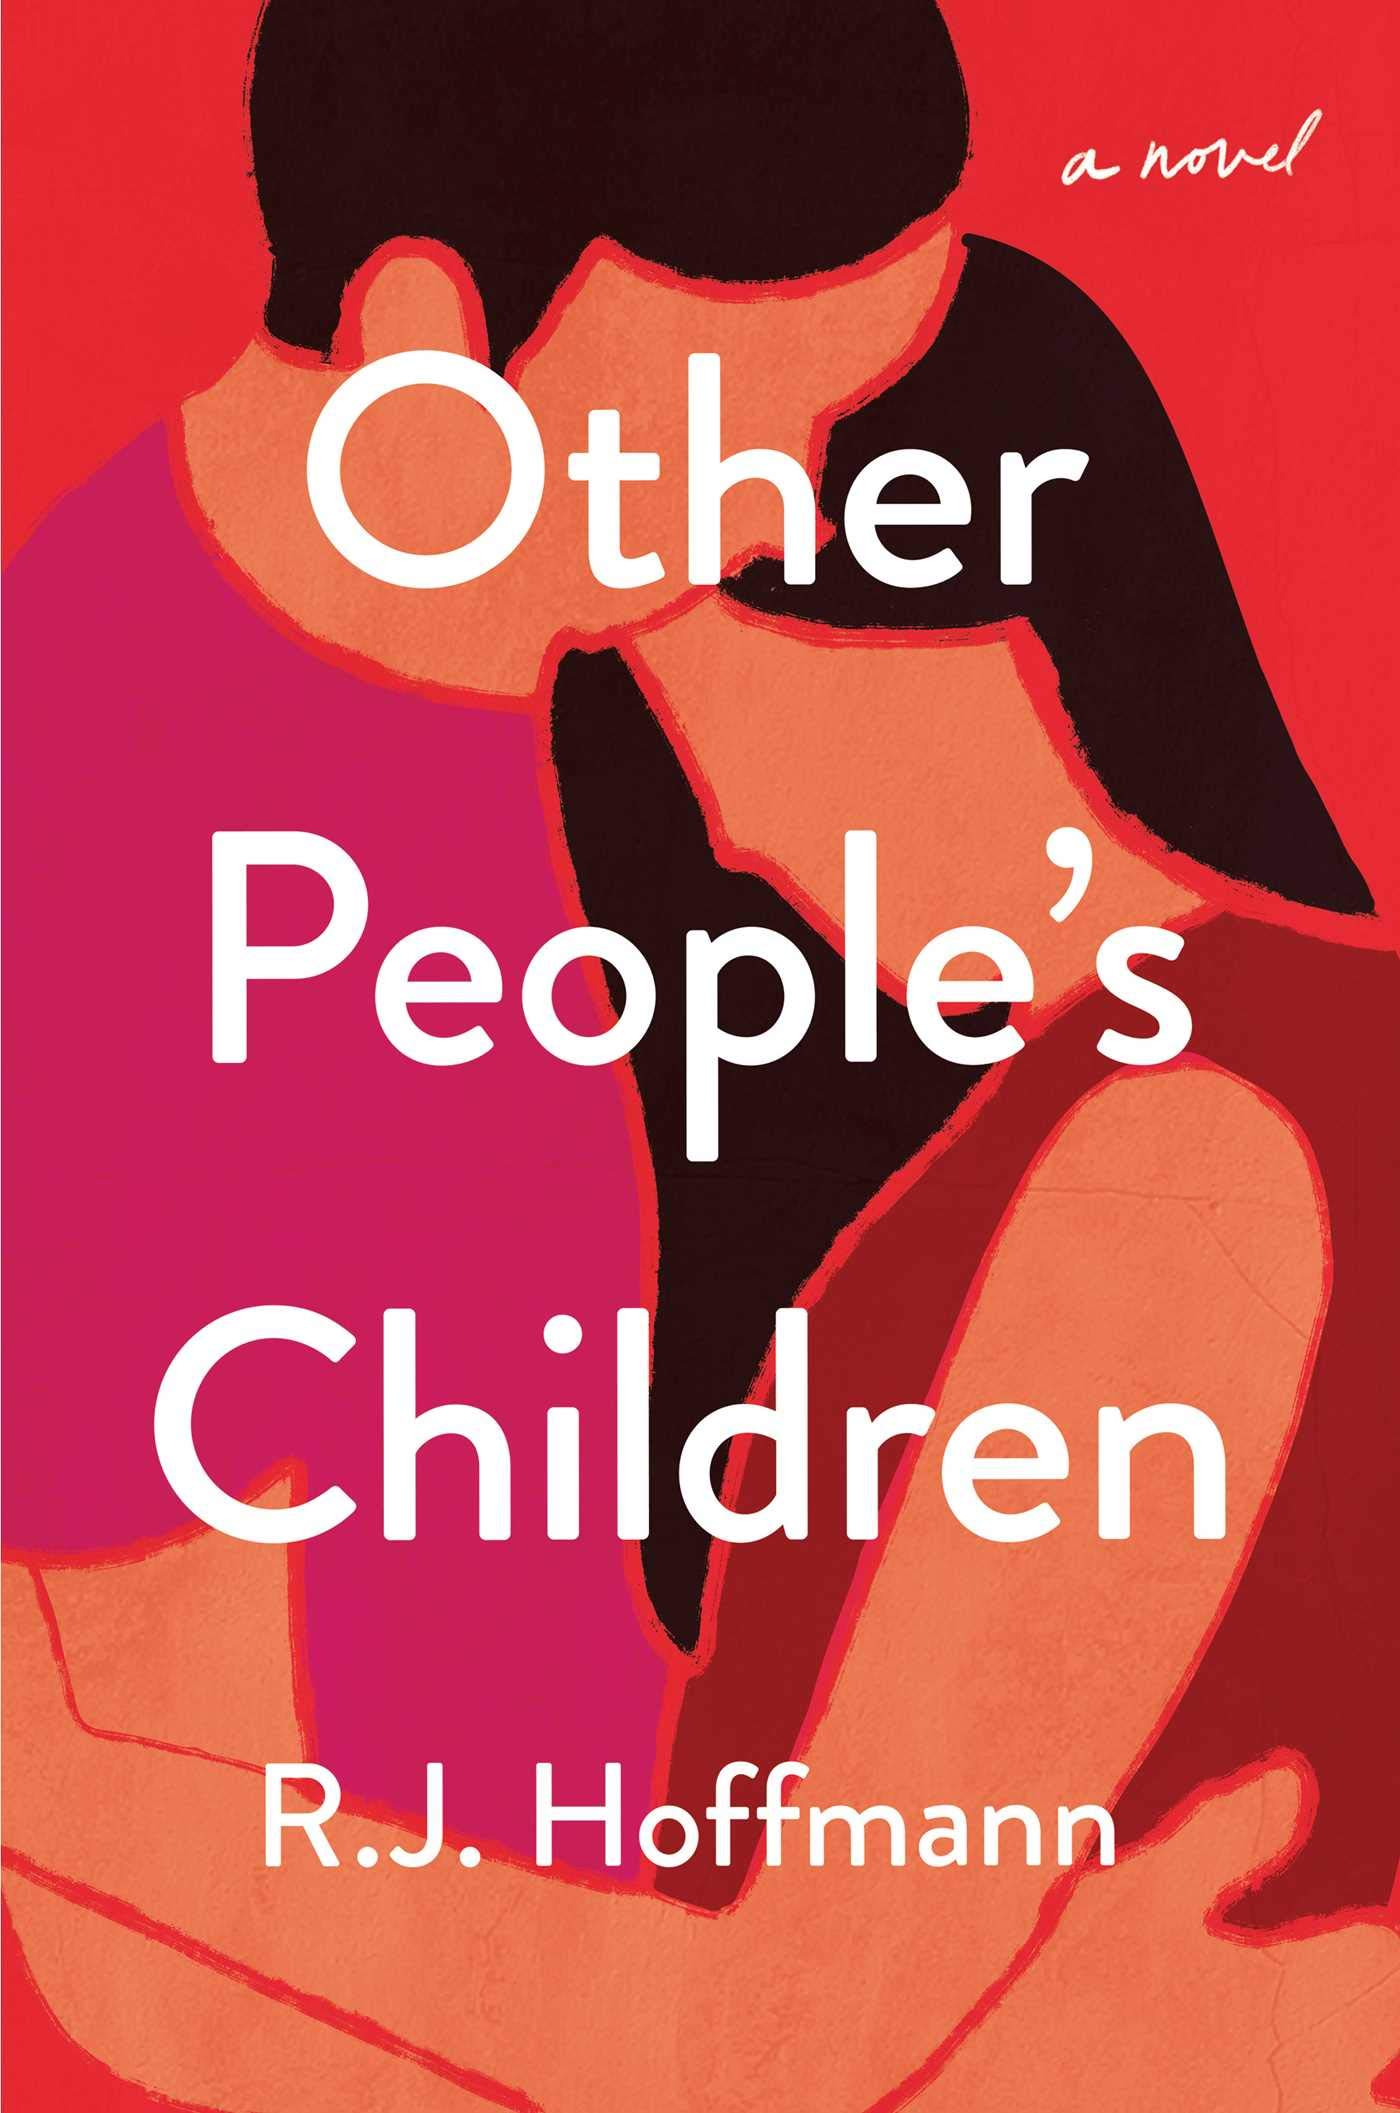 Other People's Children: A Novel: Hoffmann, R.J.: 9781982159092:  Amazon.com: Books